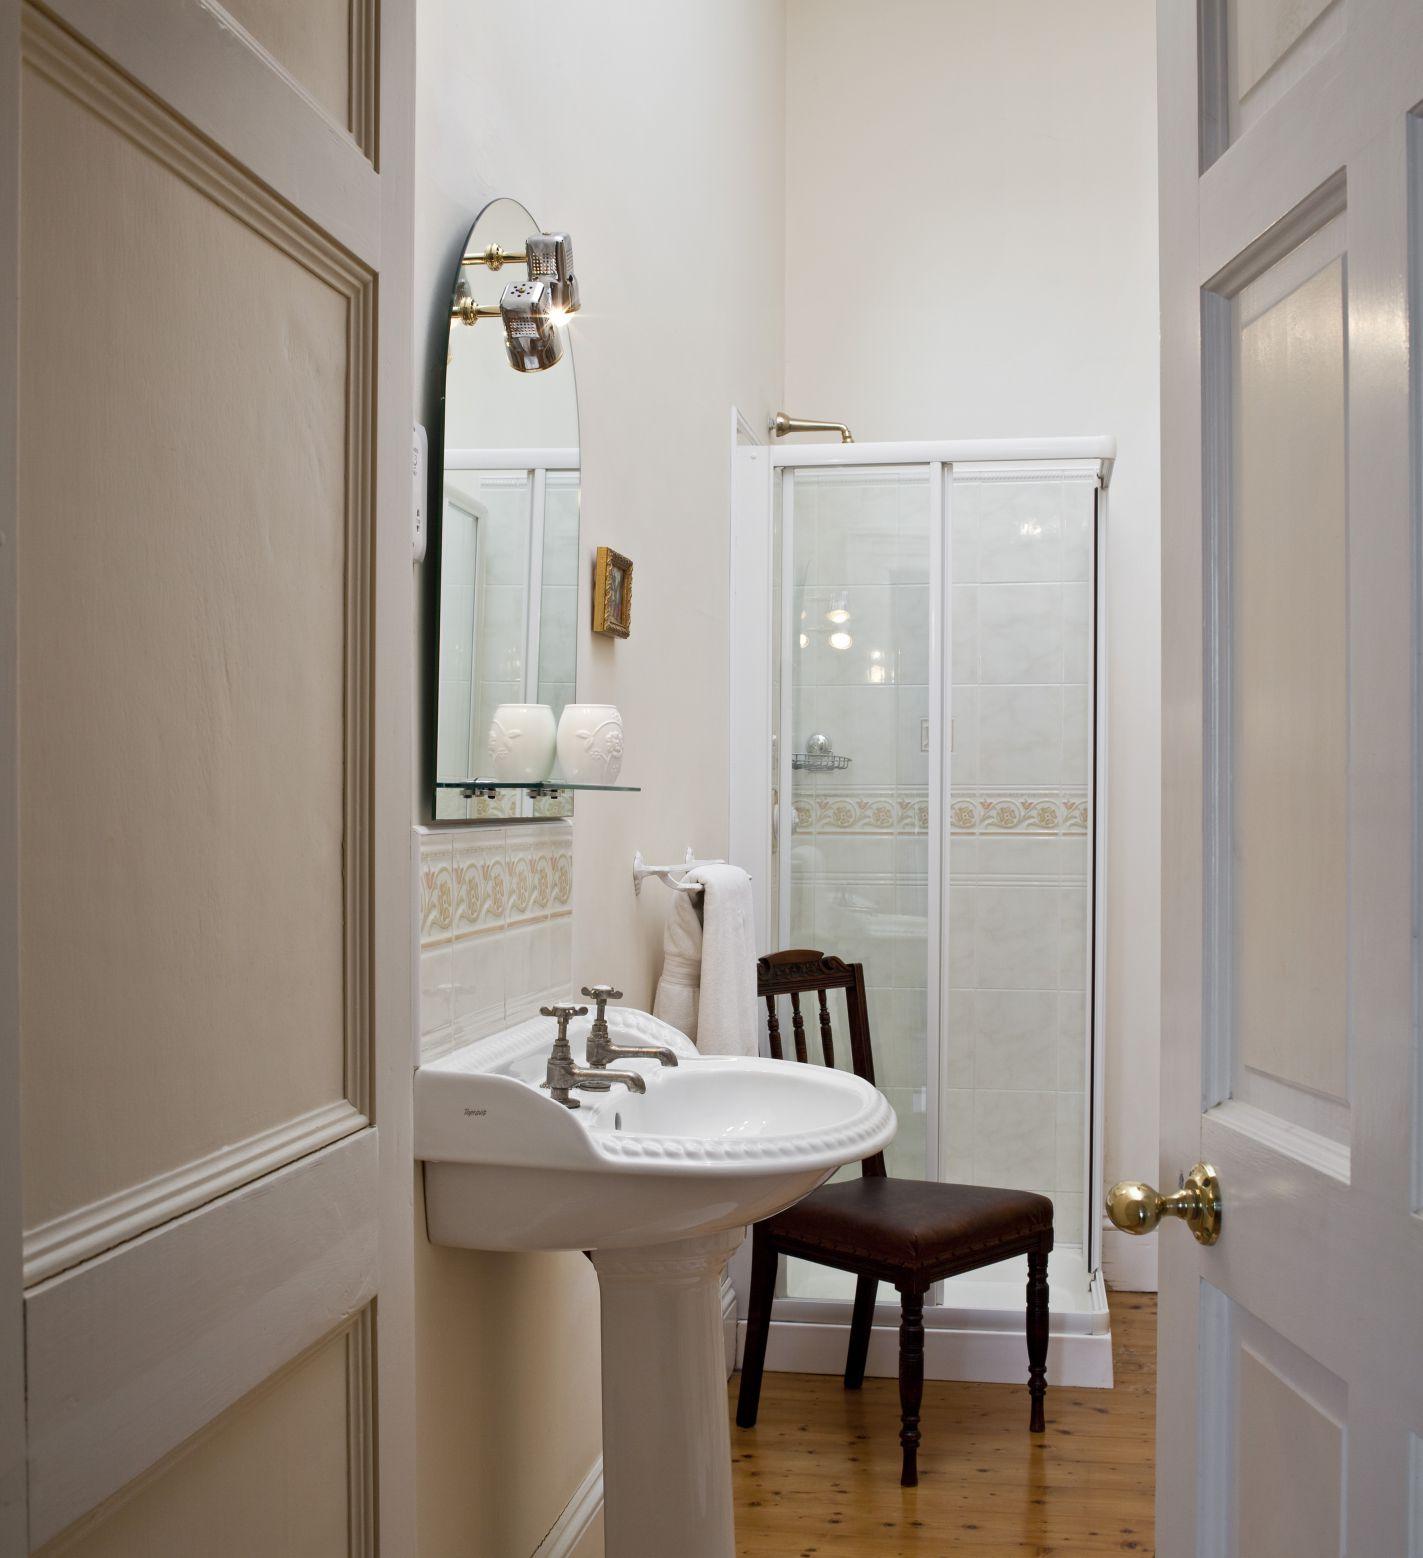 luxurious accommodation - Lisheen Castle, Ireland